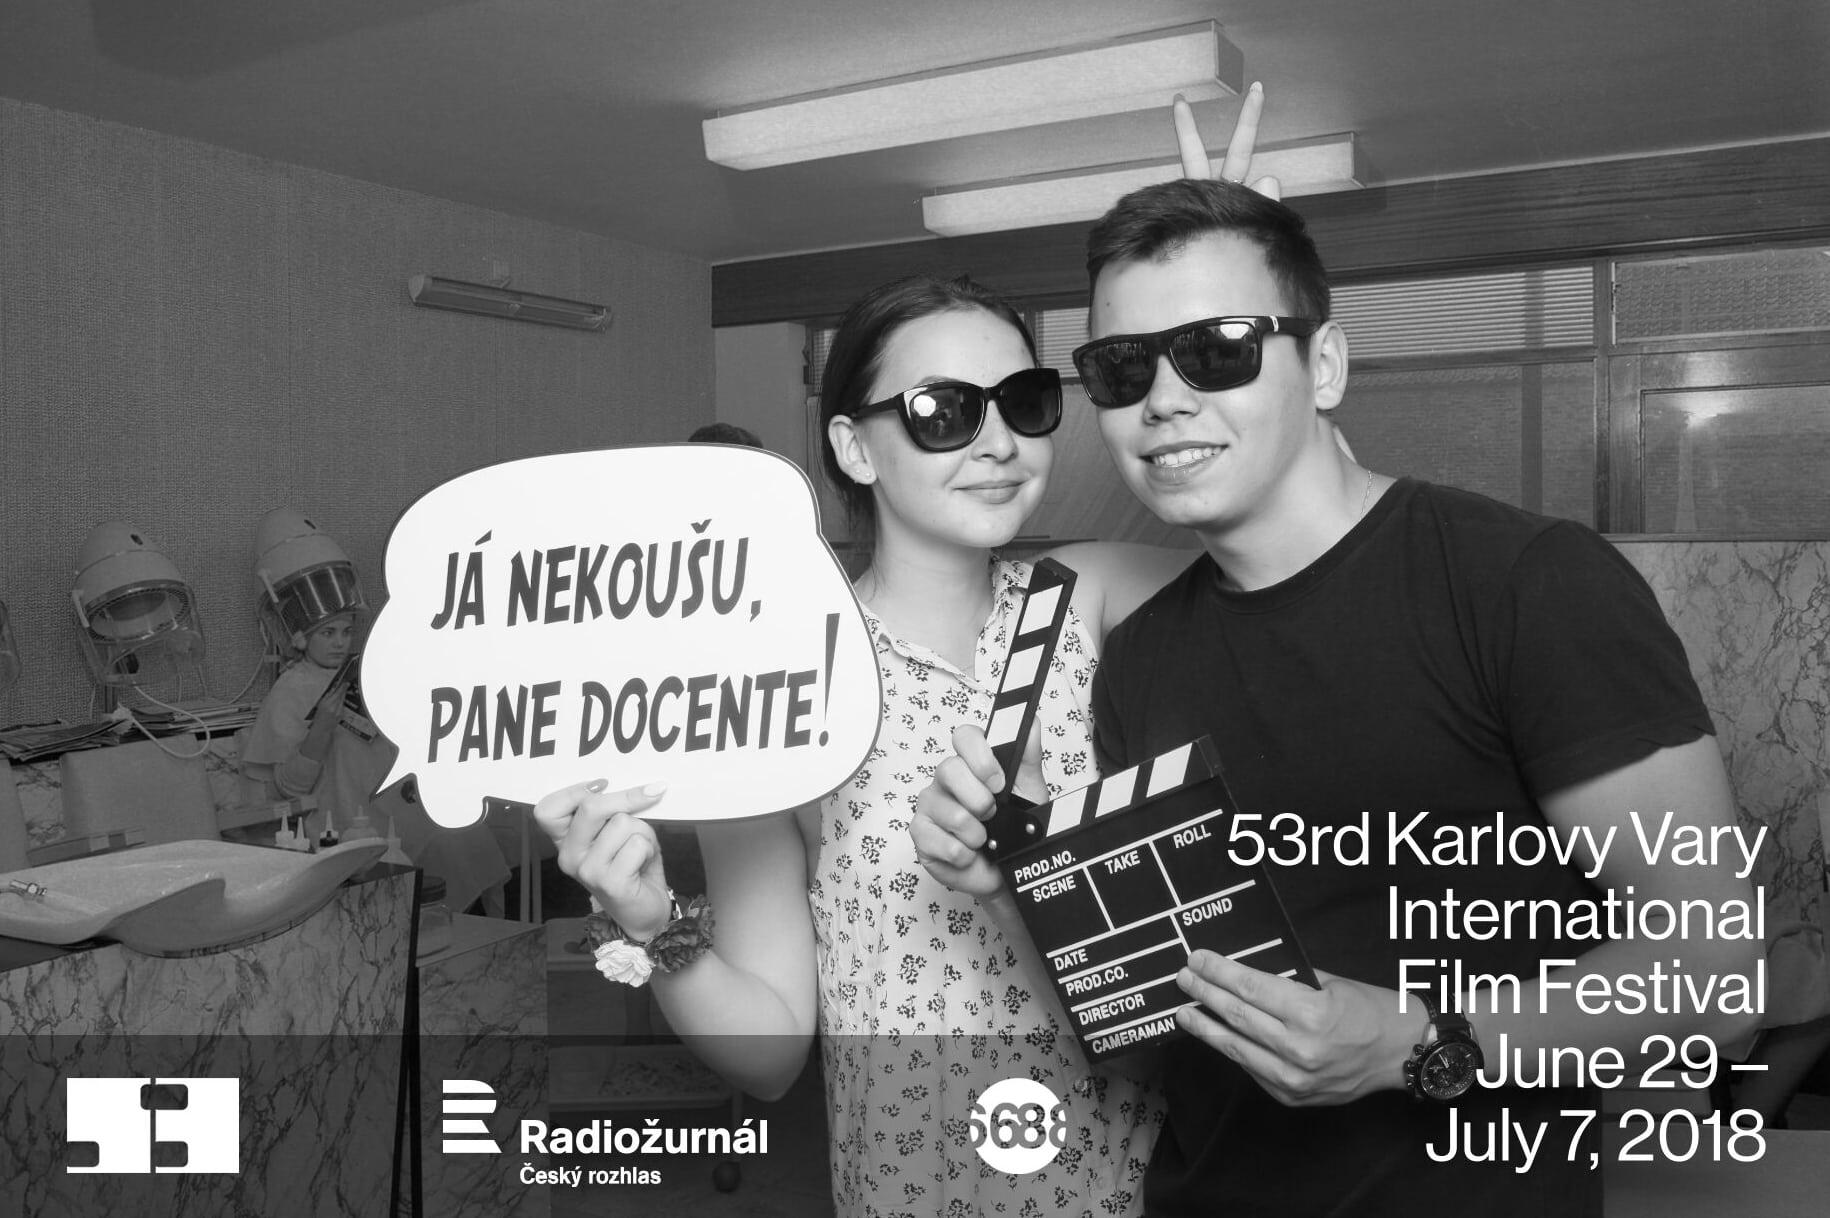 fotokoutek-festival-karlovy-vary-radiozurnal-mff-kv-29-6-2018-447234